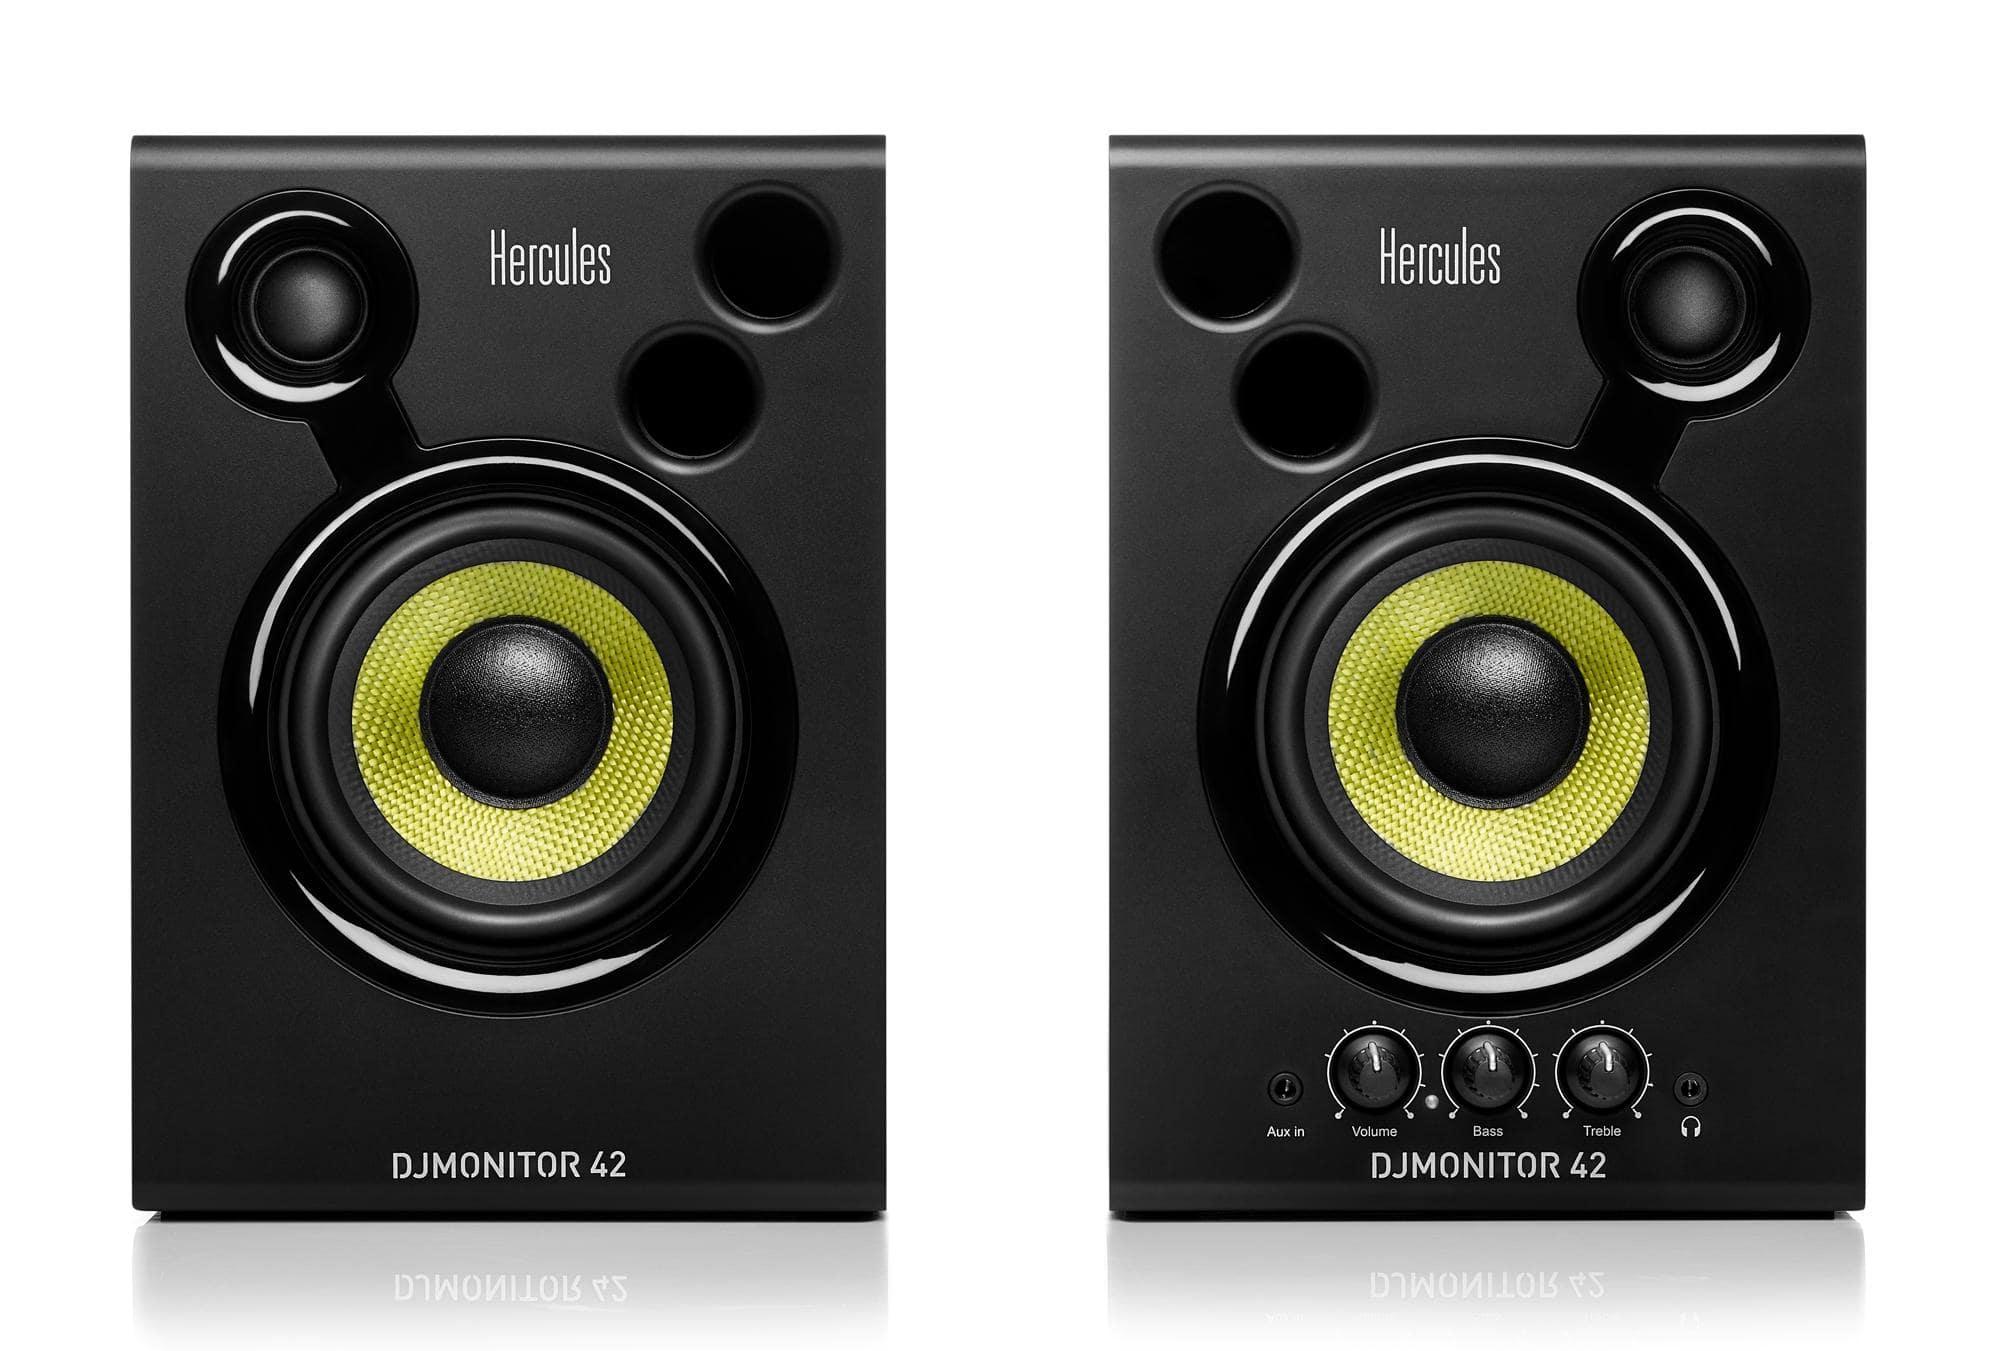 Studiomonitore - Hercules DJMonitor 42 - Onlineshop Musikhaus Kirstein